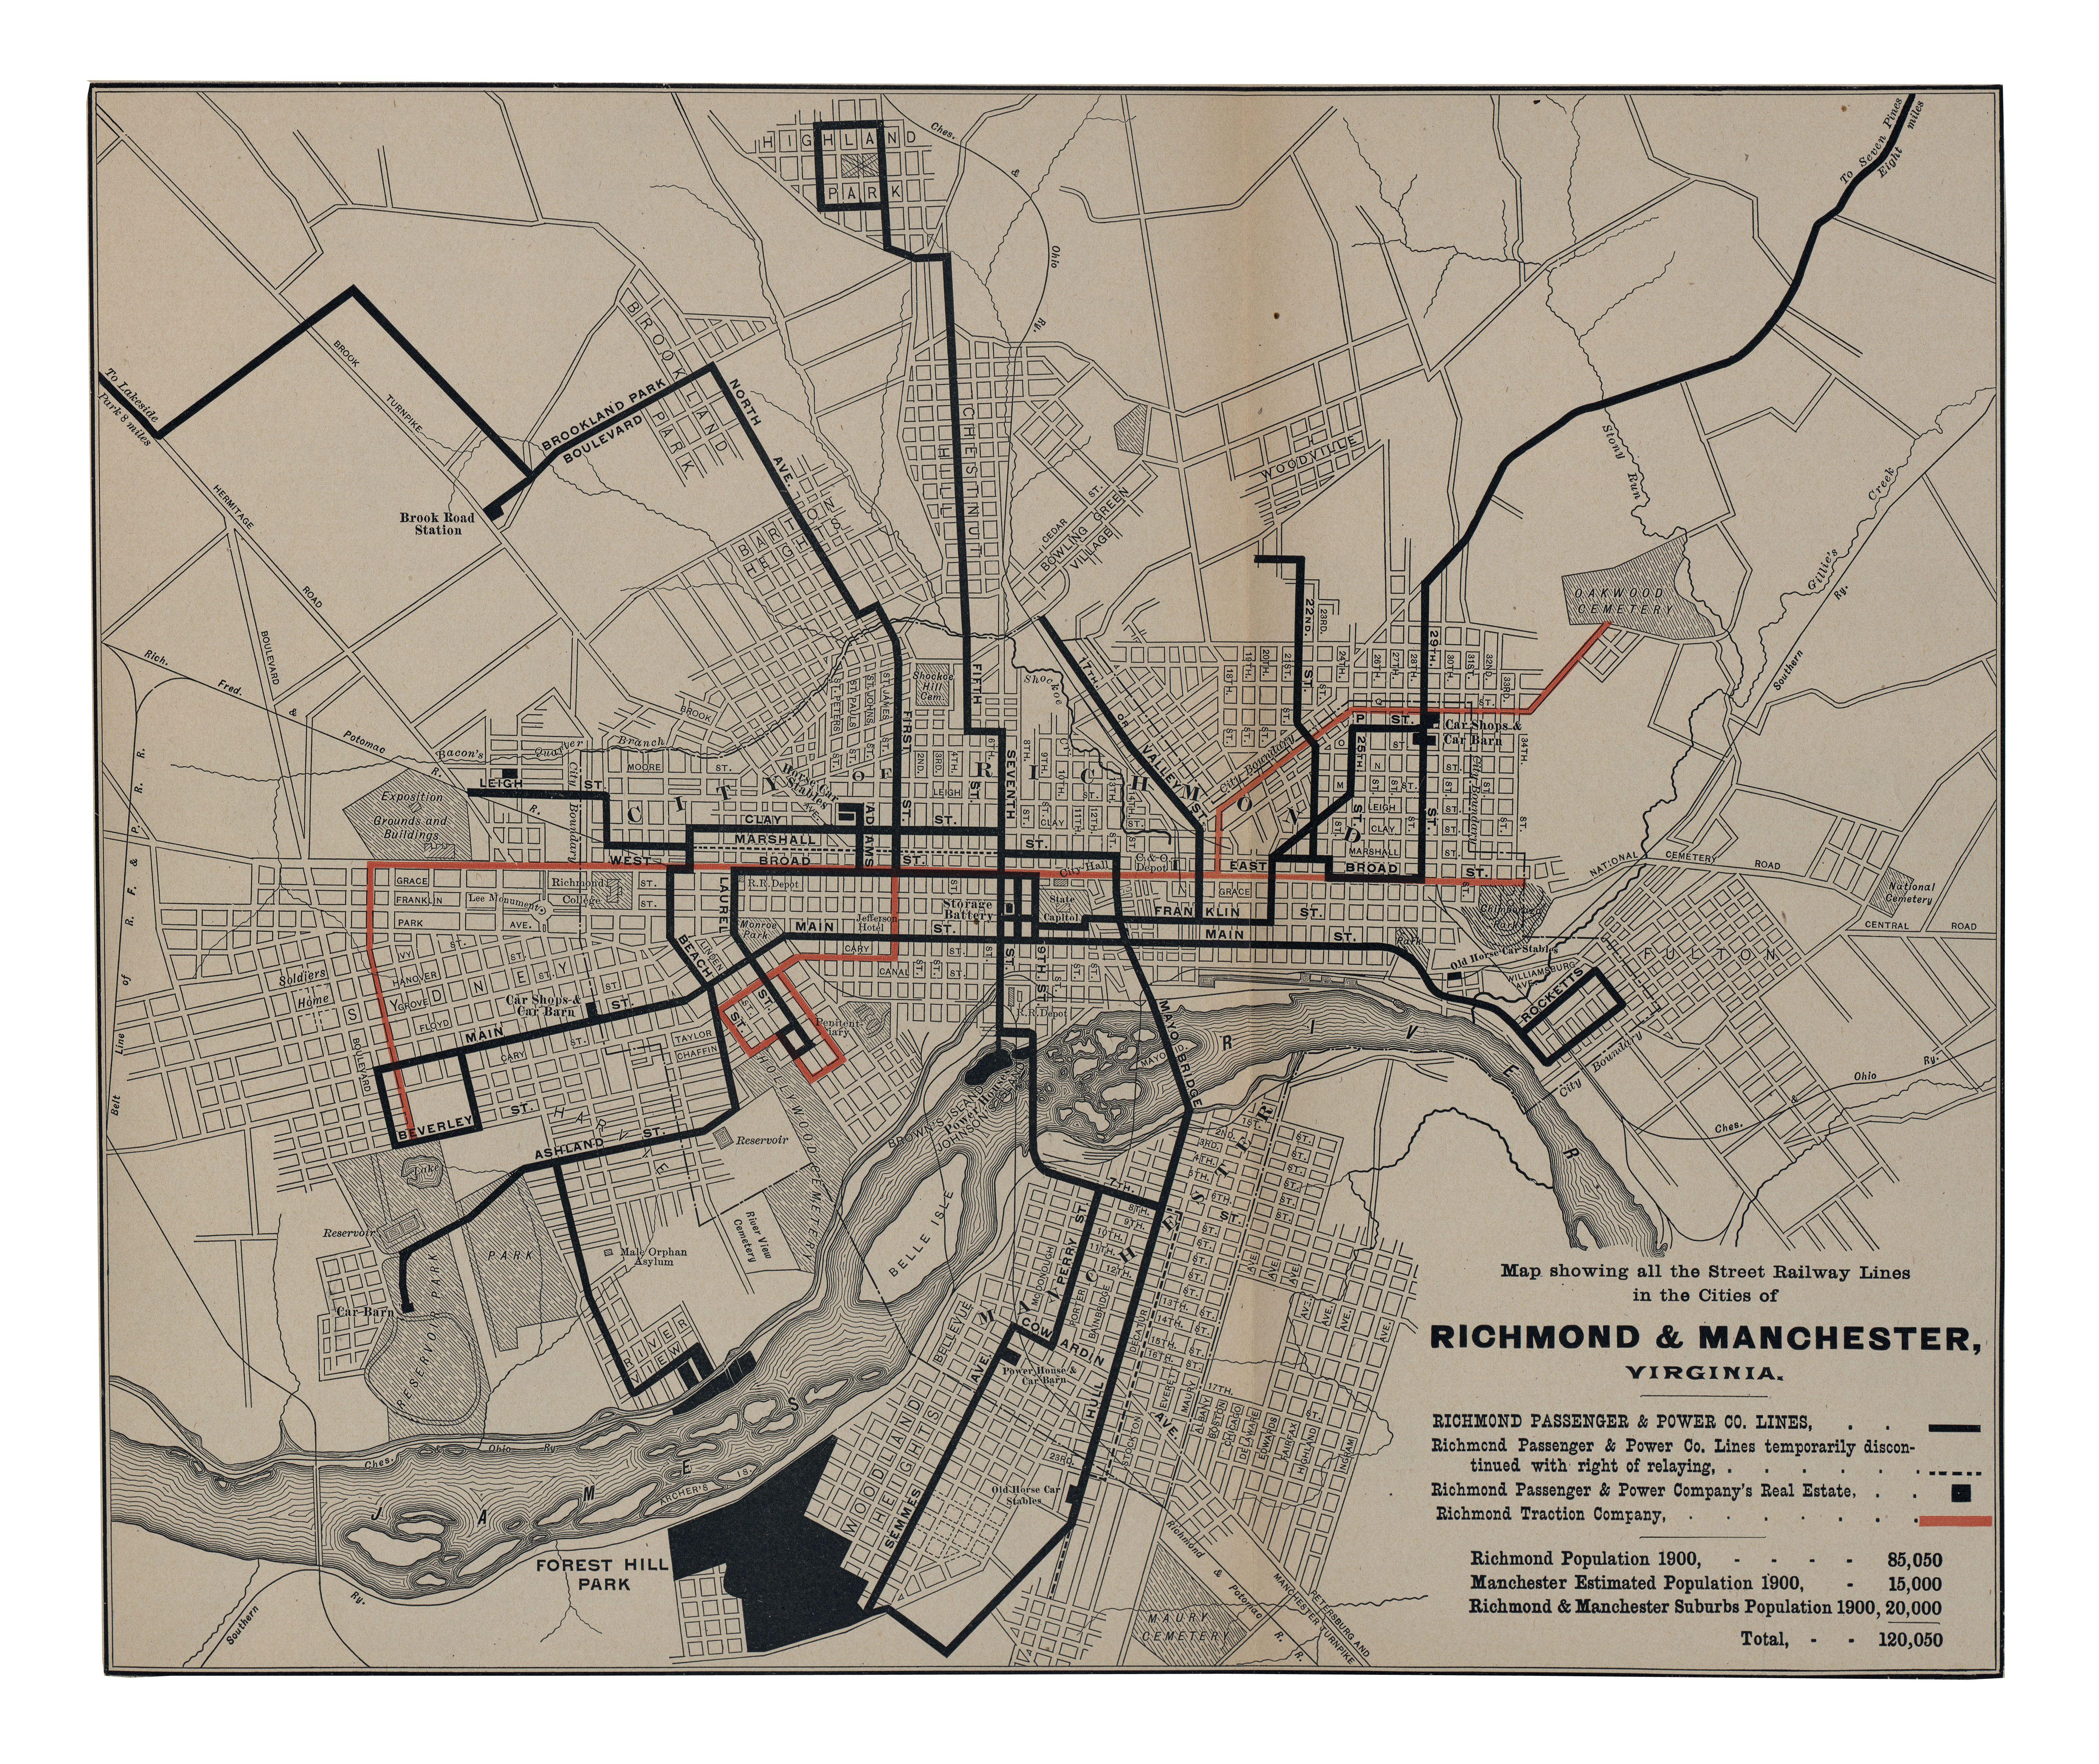 txu-oclc-6445490-street_railway-richmond-1901.jpg (5720×4807)